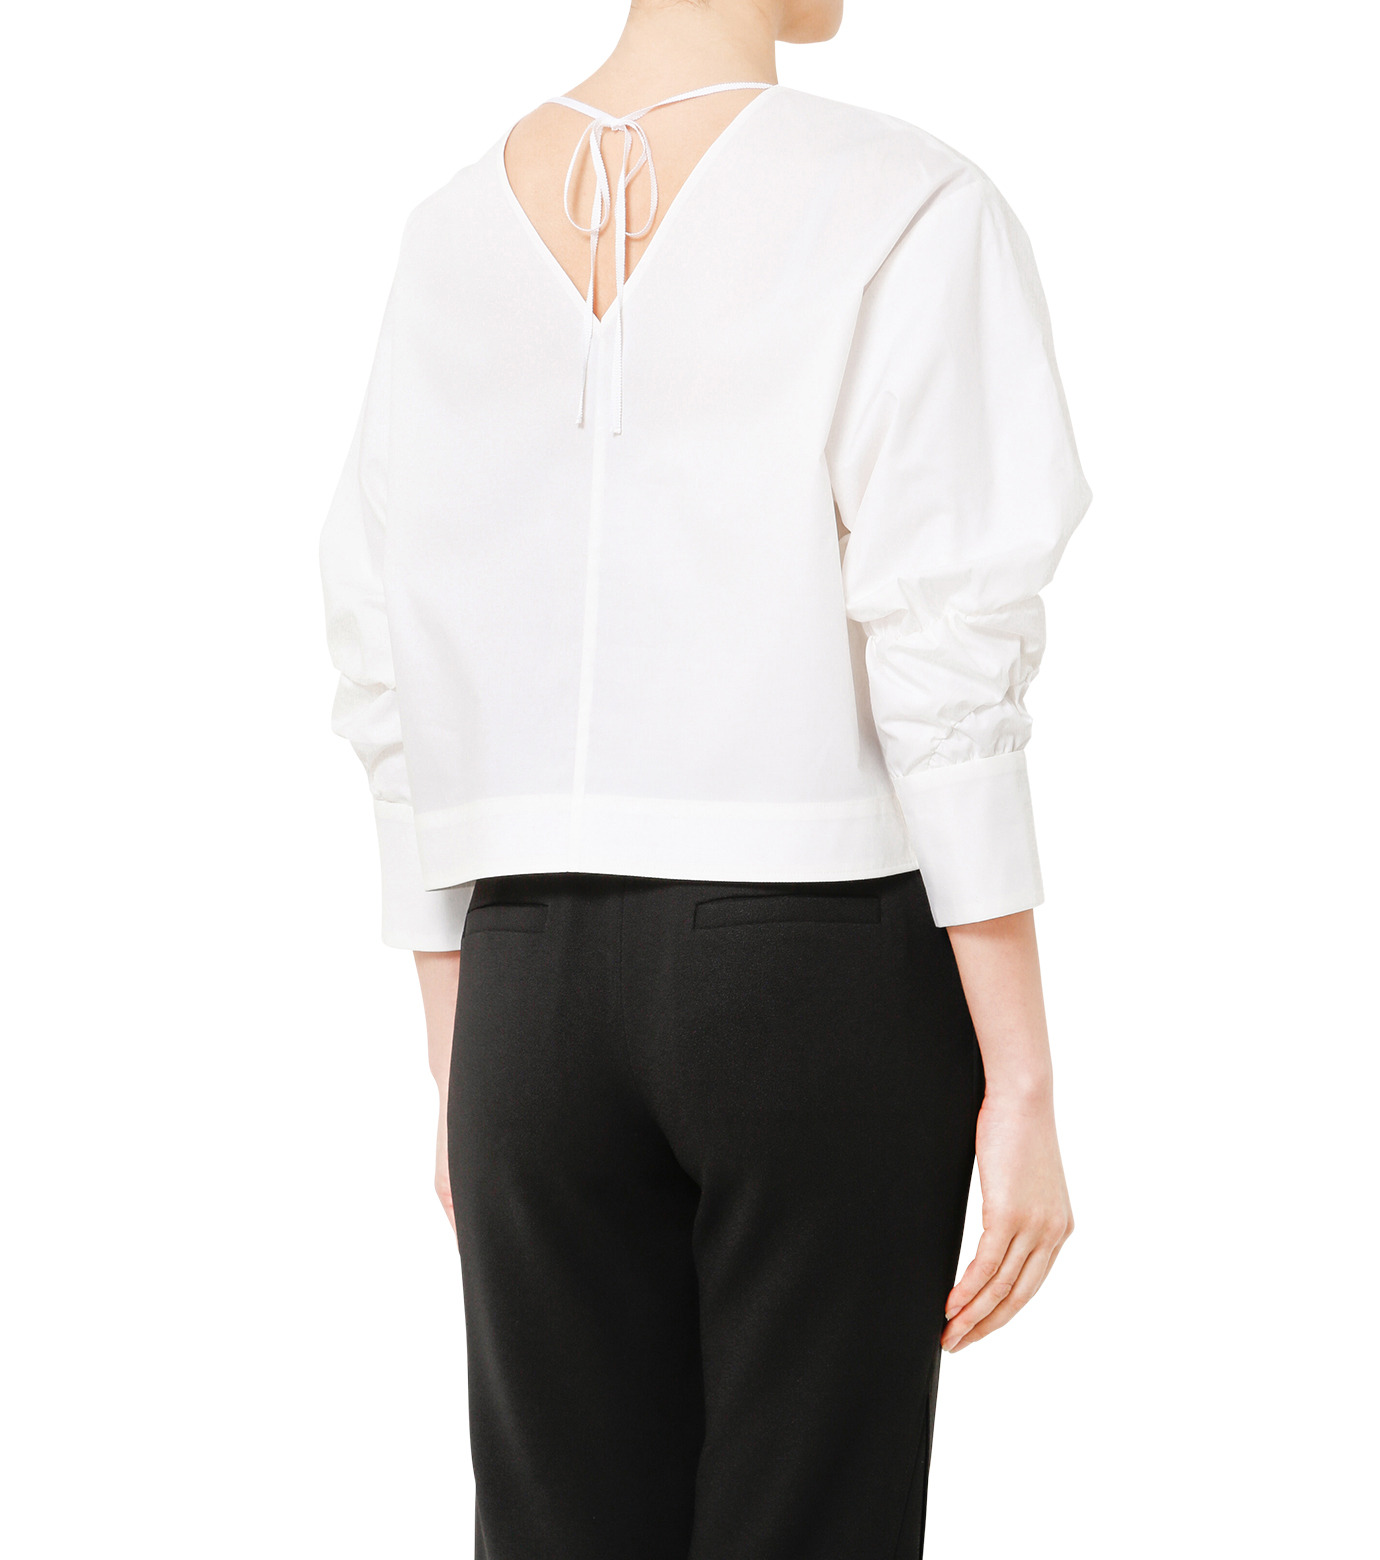 LE CIEL BLEU(ルシェルブルー)のタイプライターシュリンクスリーブトップス-WHITE(シャツ/shirt)-19S63104 拡大詳細画像4